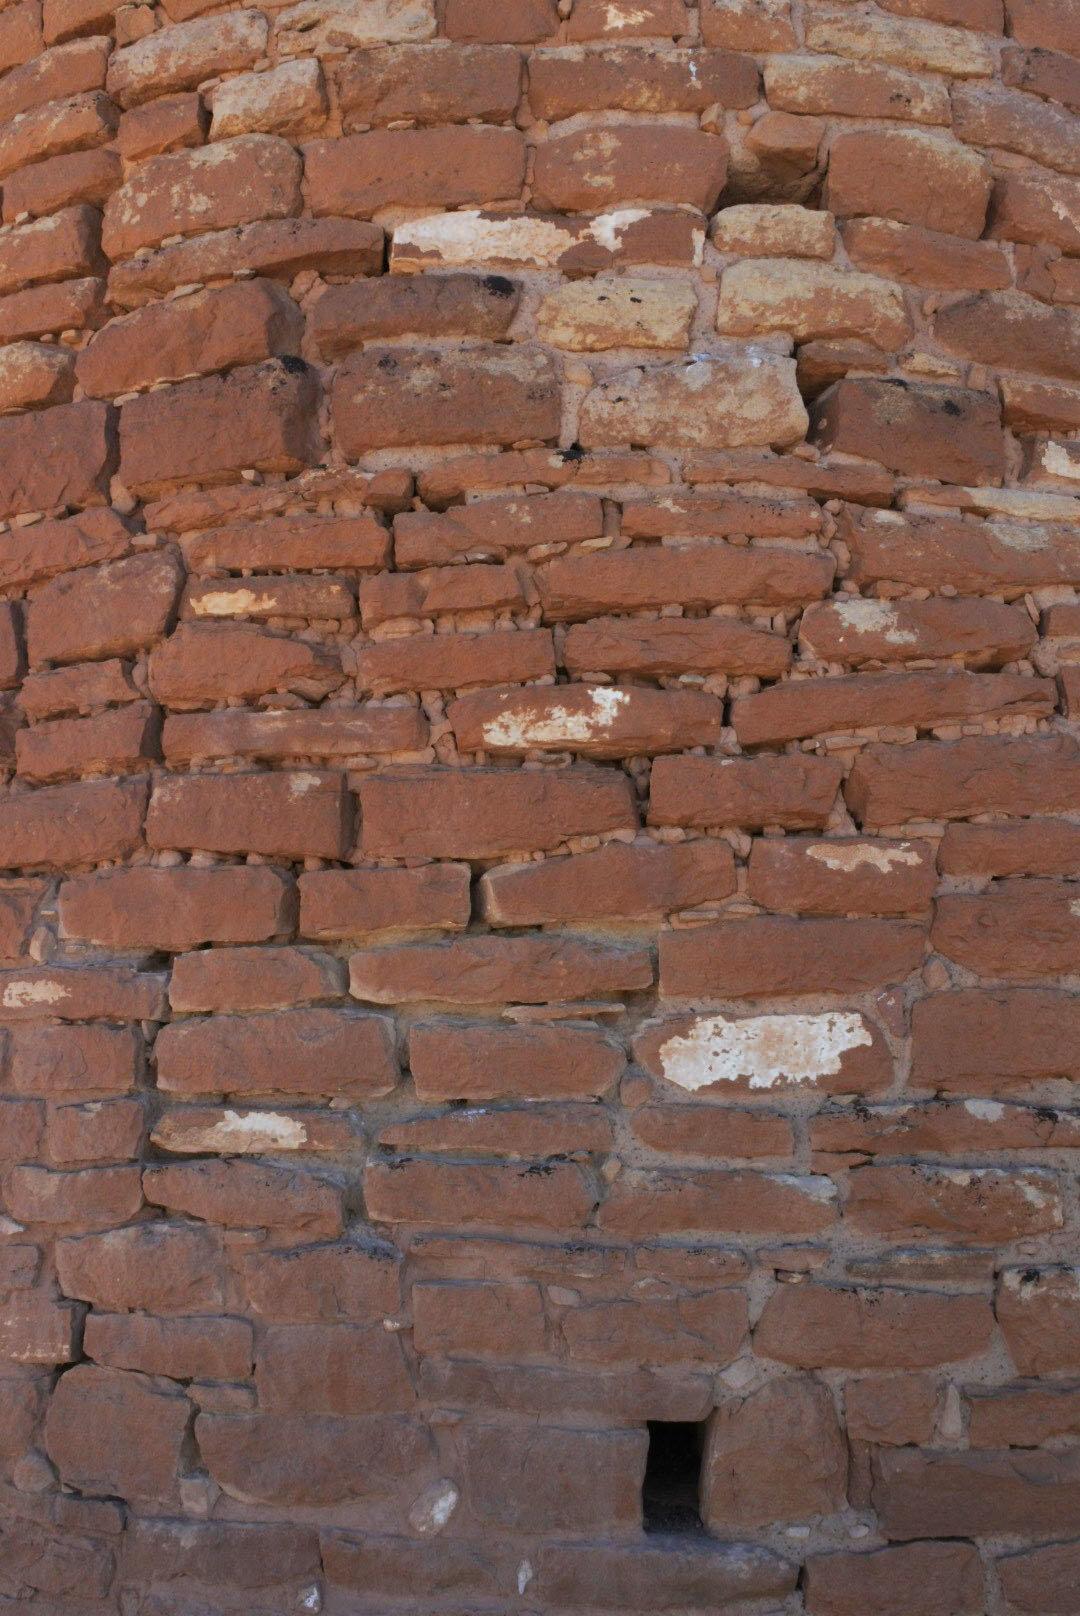 Houvenweep masonry with chinking stones